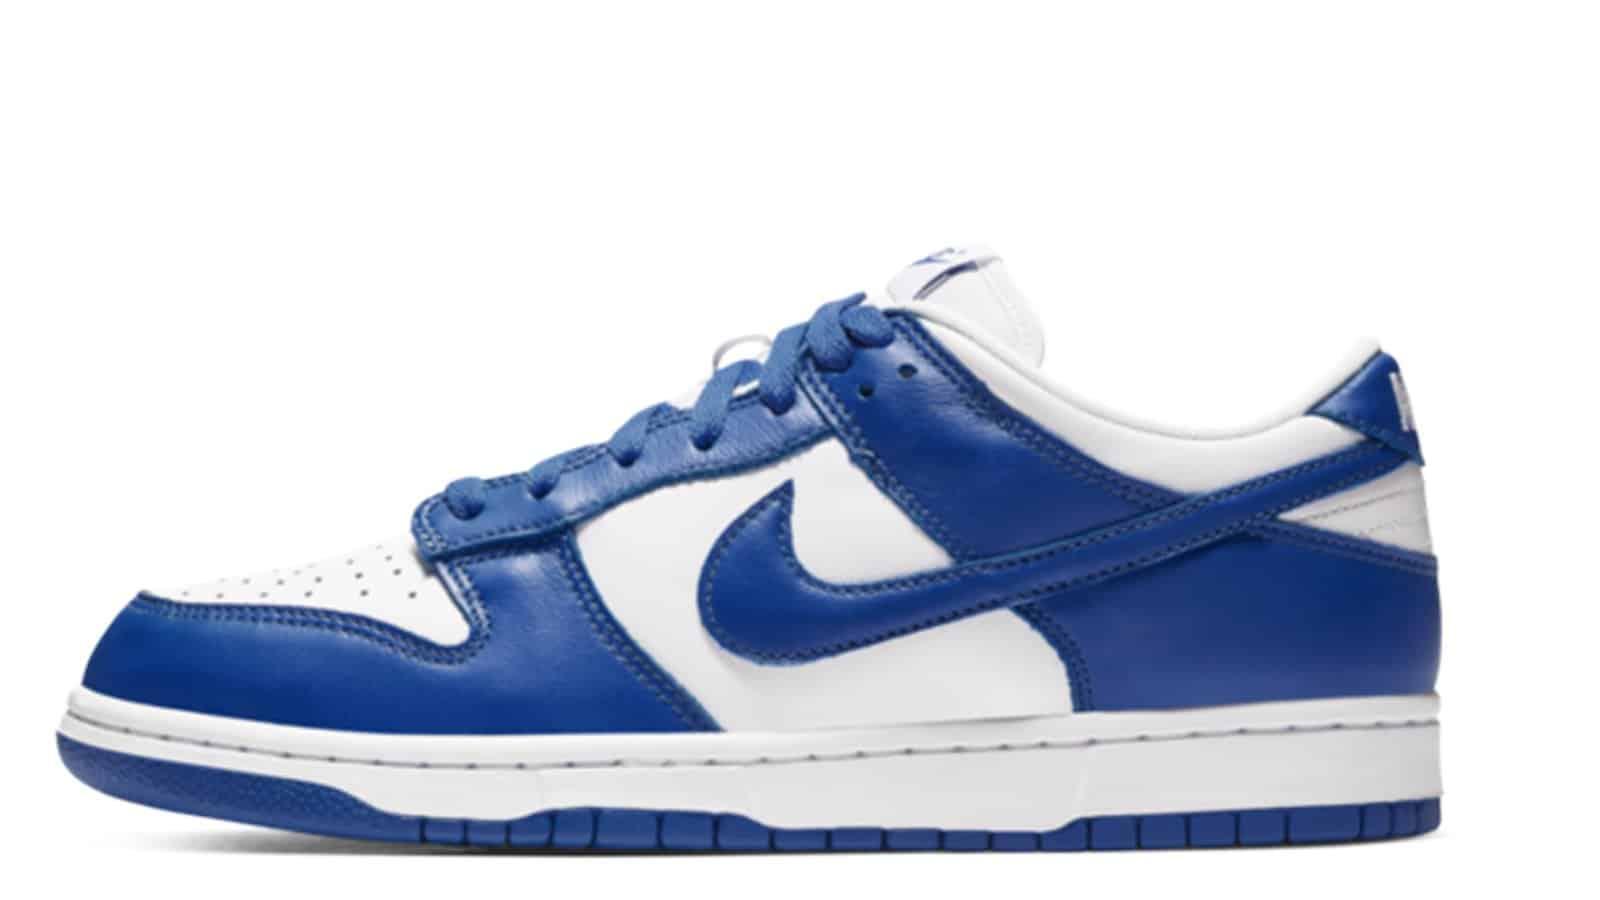 Nike Dunk Low SP 'Kentucky'